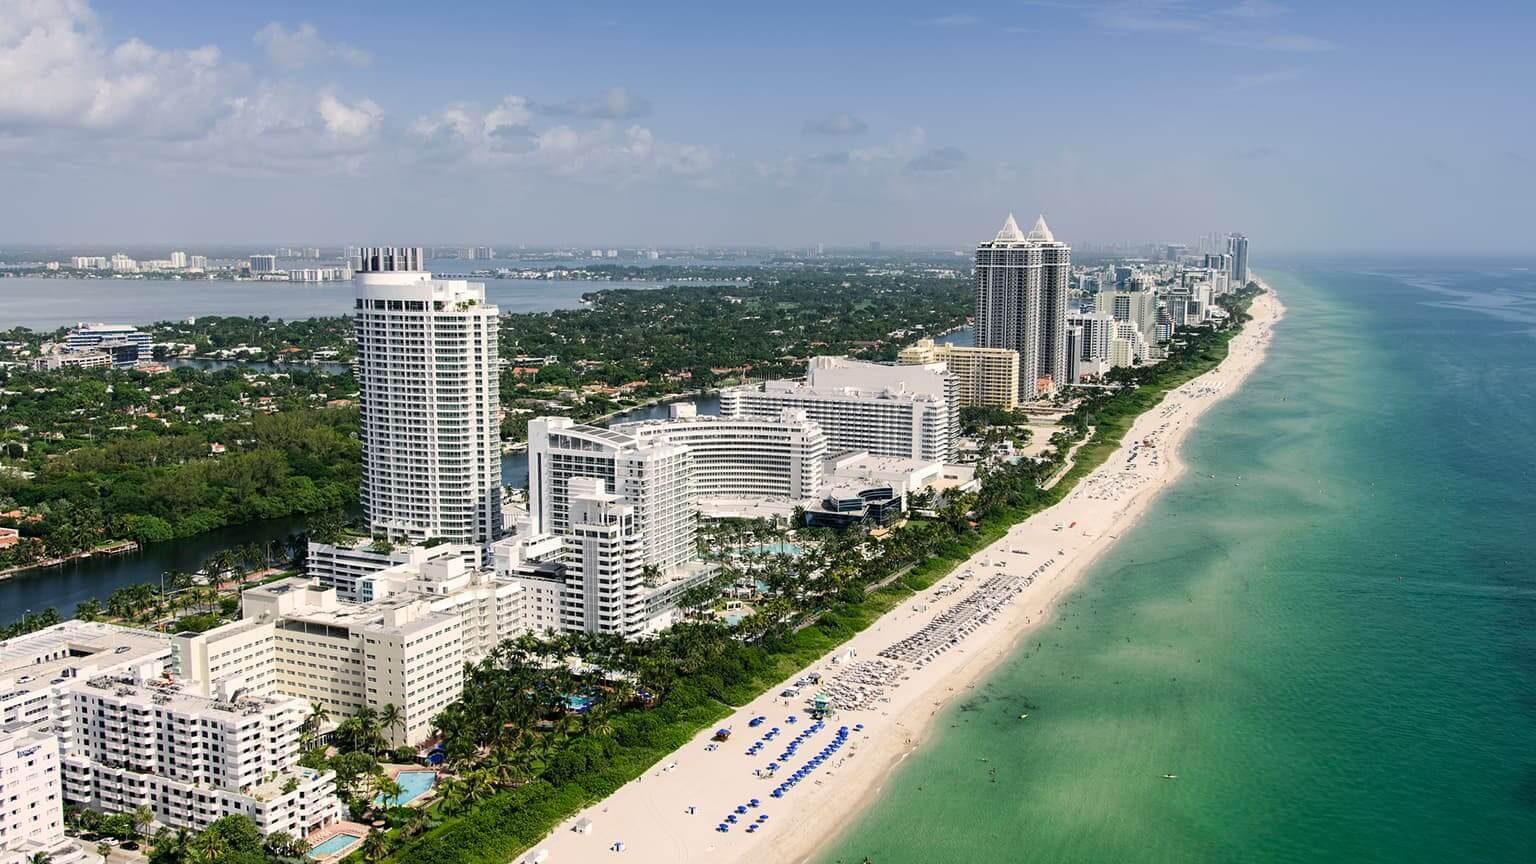 Florida, Miami, Aerial view of coastal city